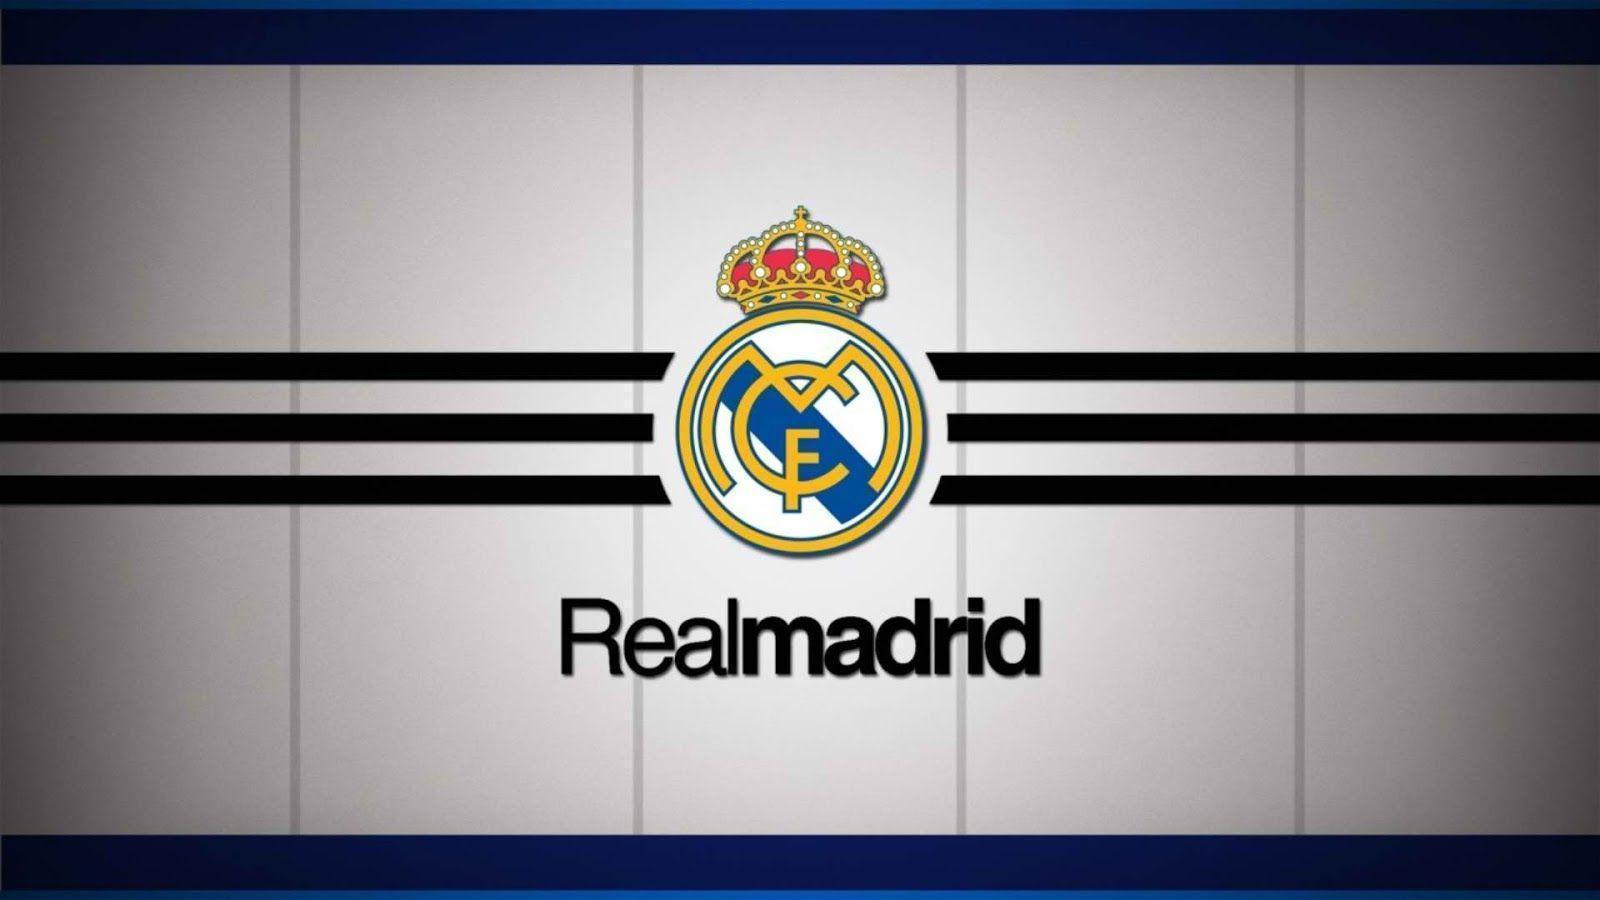 Real Madrid Wallpaper Hd Free PC Wallpapers SaxonyBlue